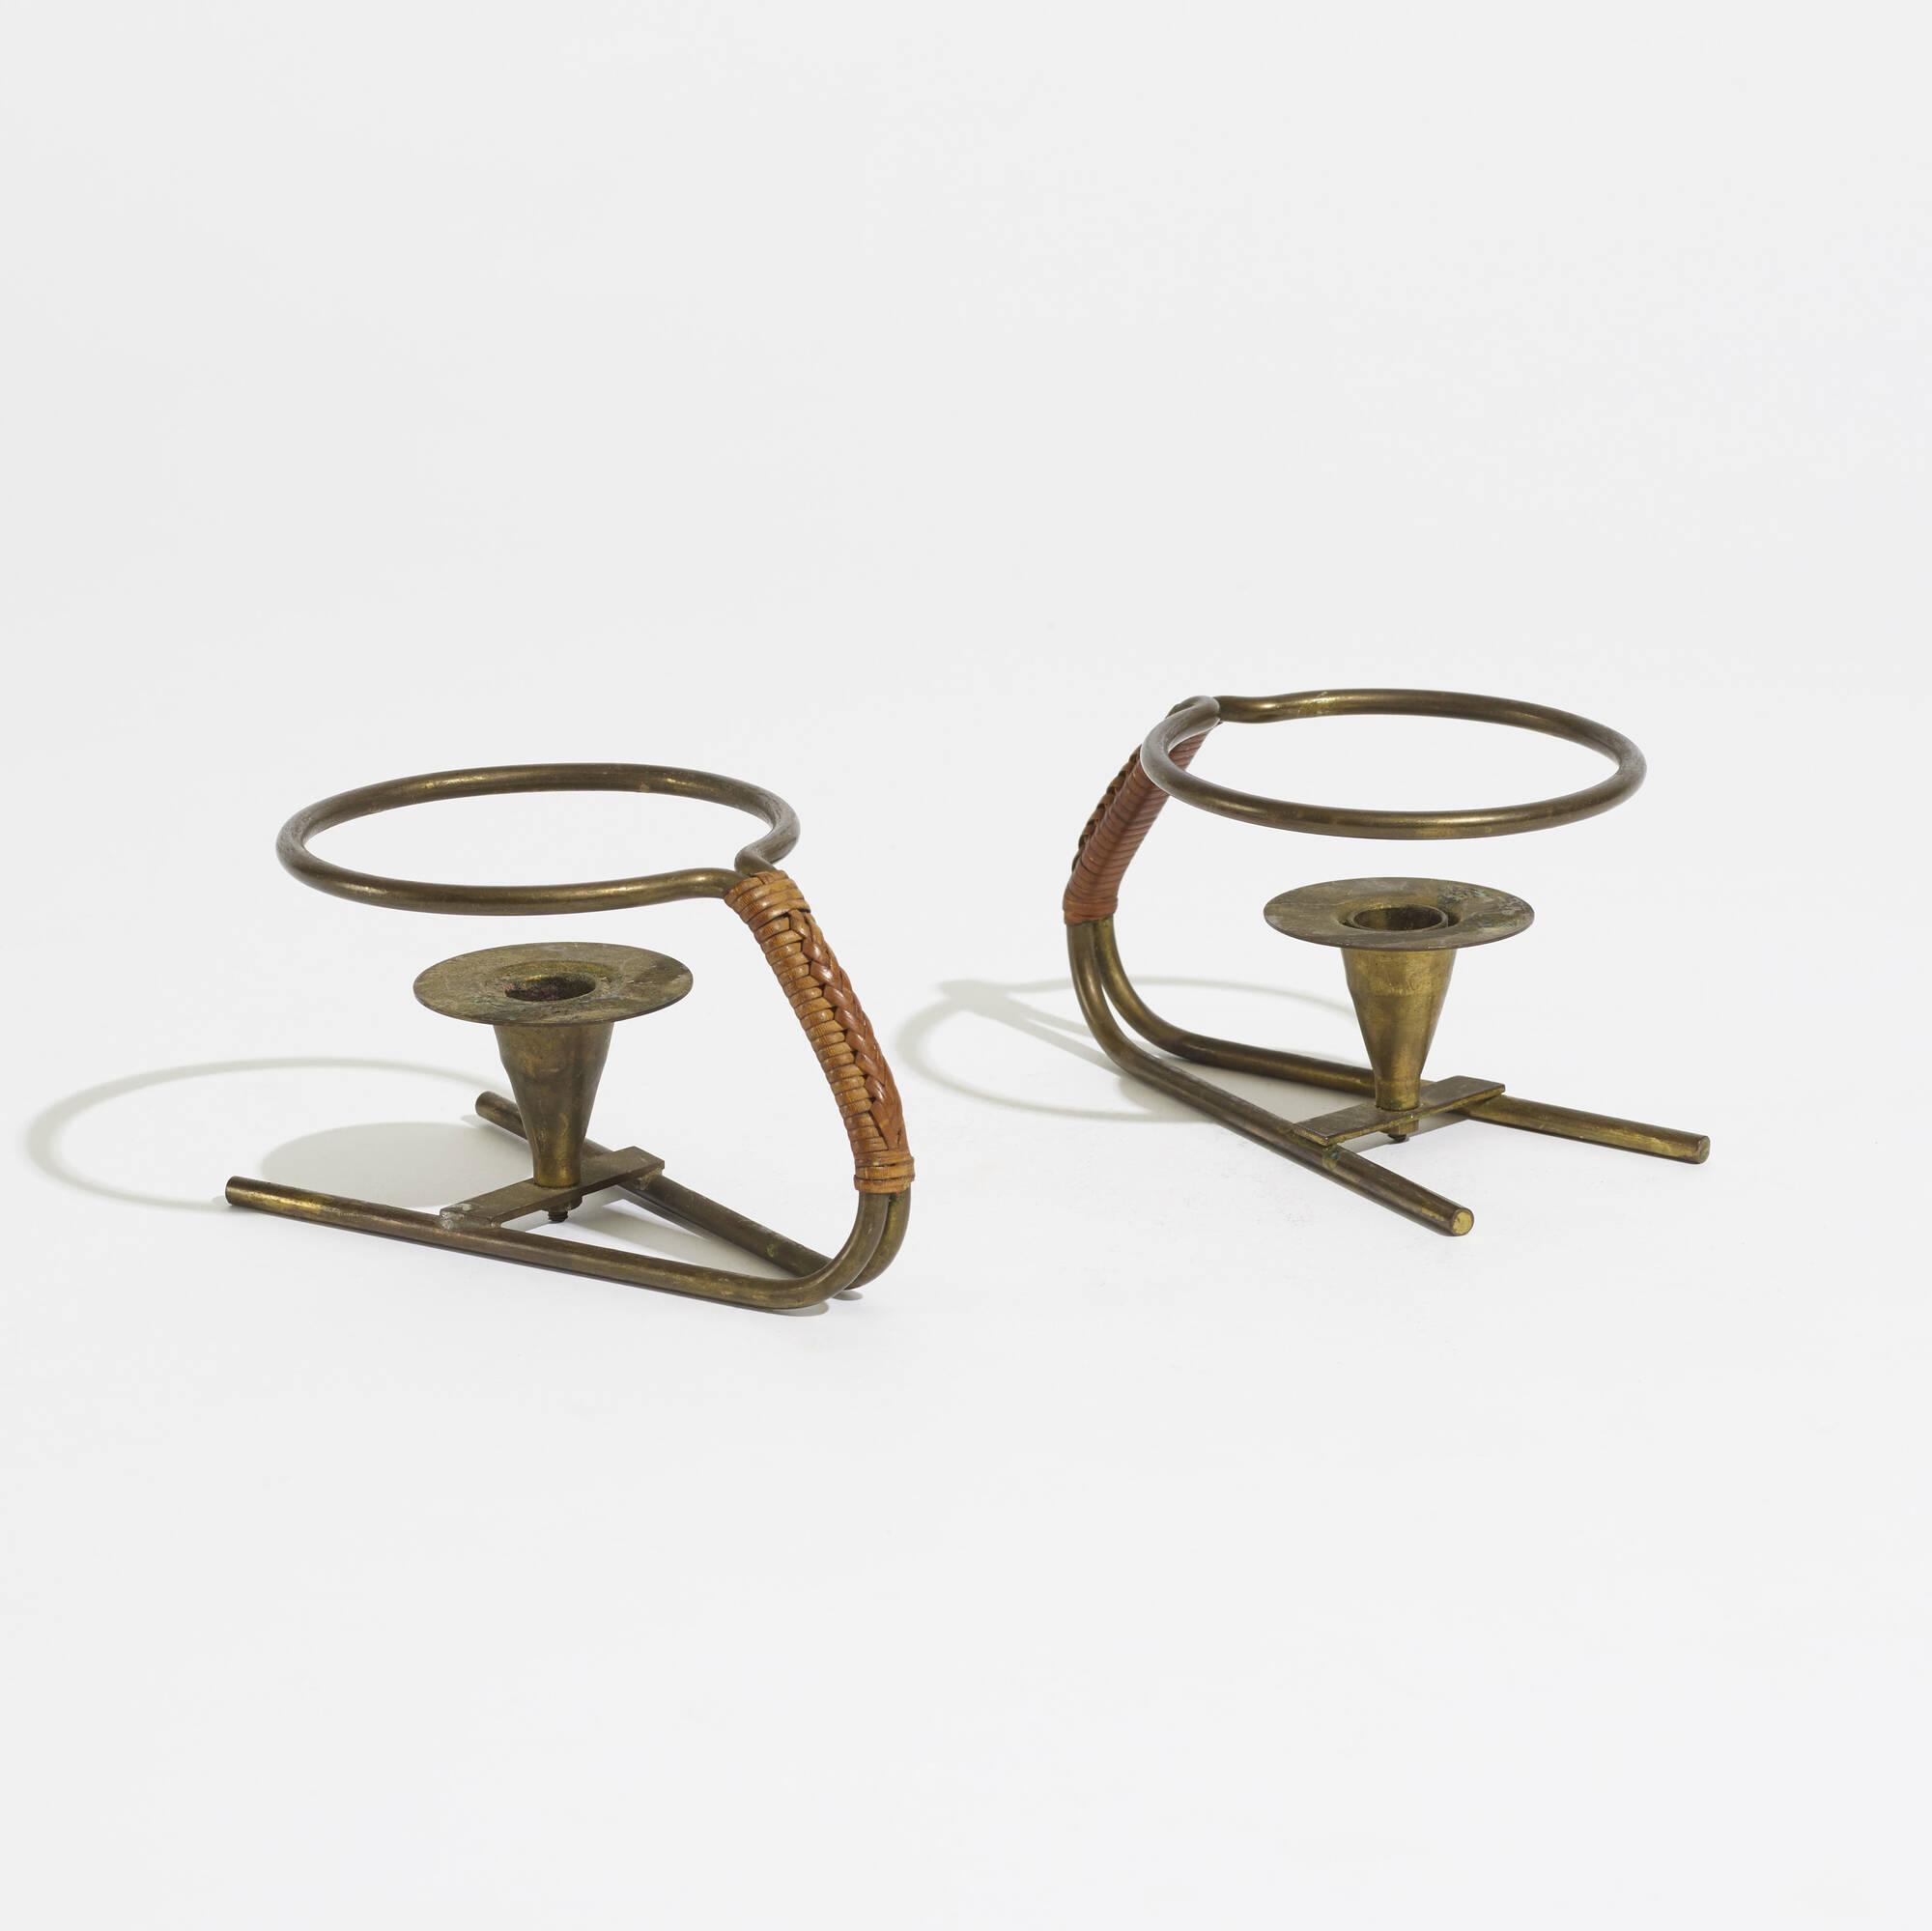 153: Carl Auböck II / rare candlesticks (2 of 2)